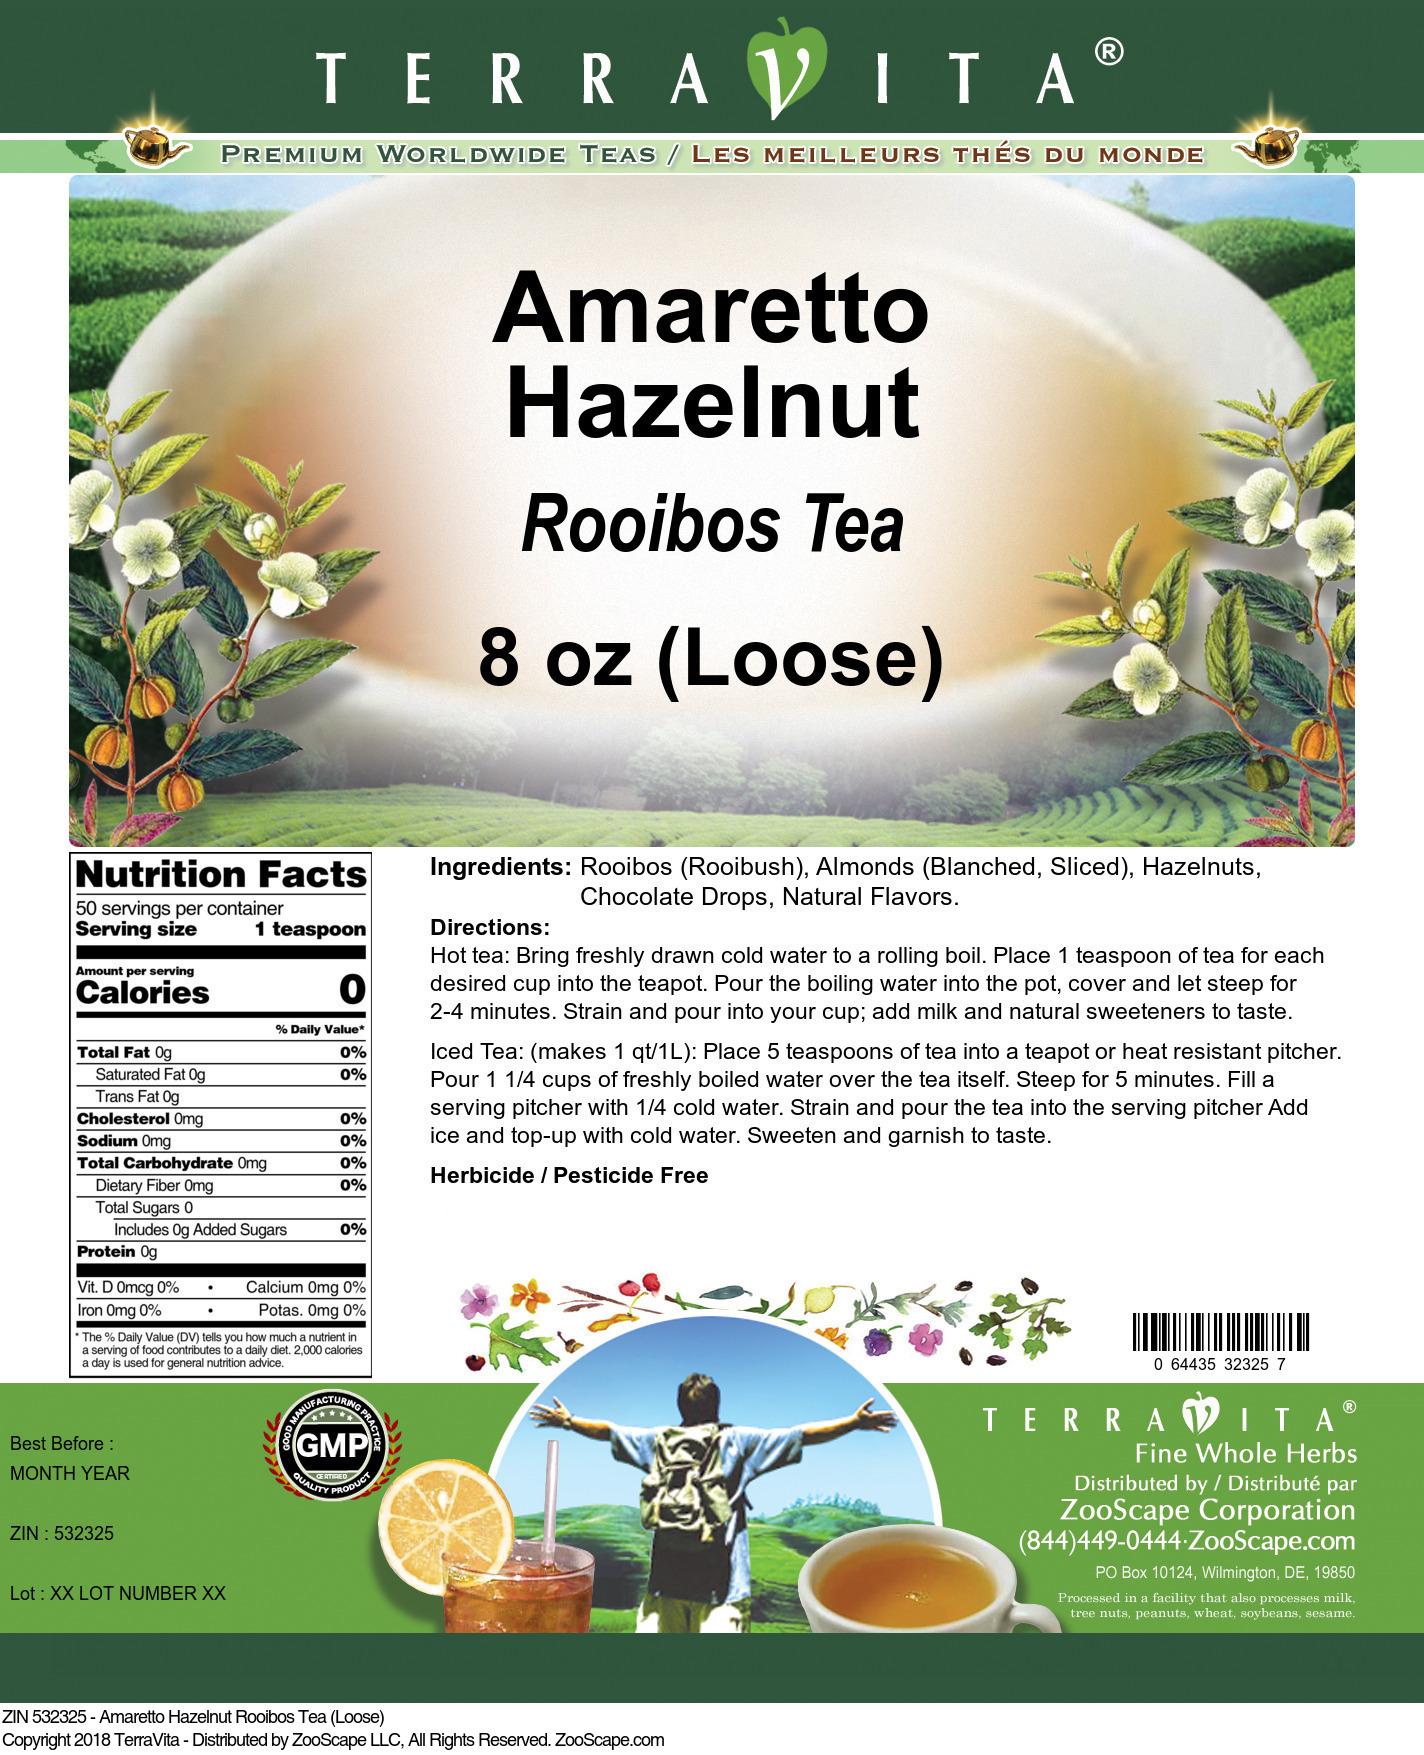 Amaretto Hazelnut Rooibos Tea